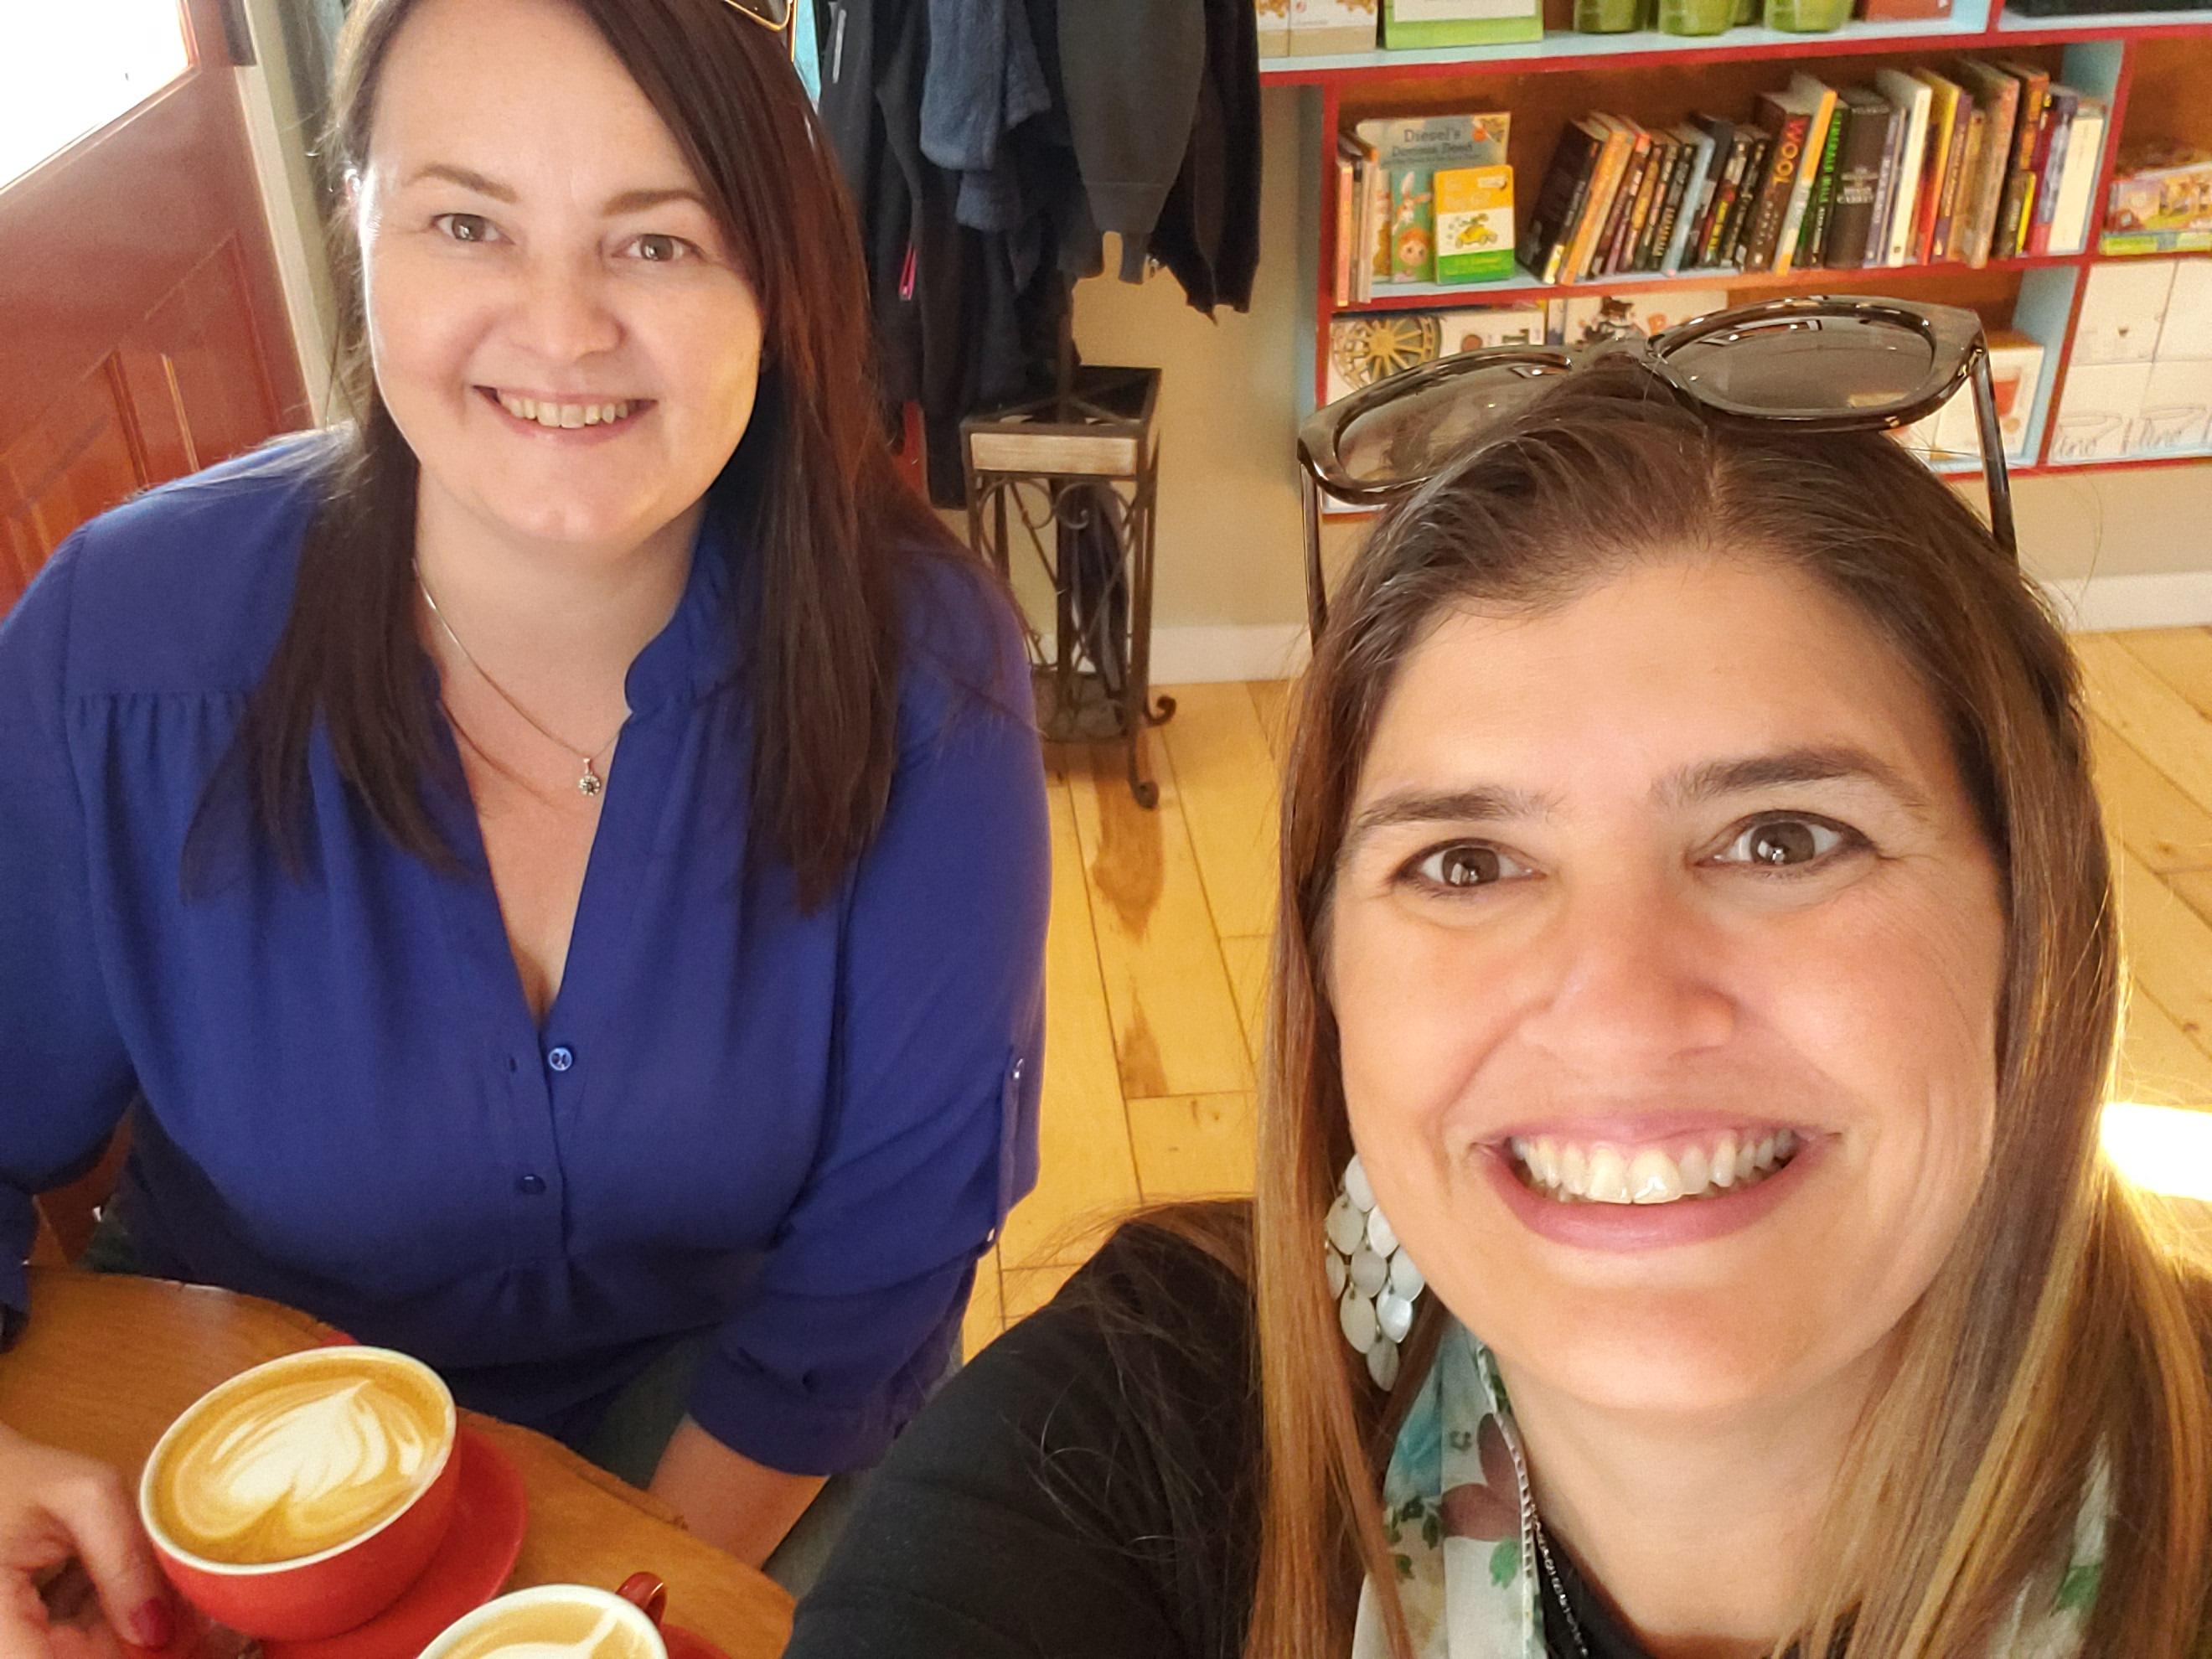 Realtor Kelsey Lane chats with Alice Riiski Kempton closet designer S'bastians coffee Redwood City, CA